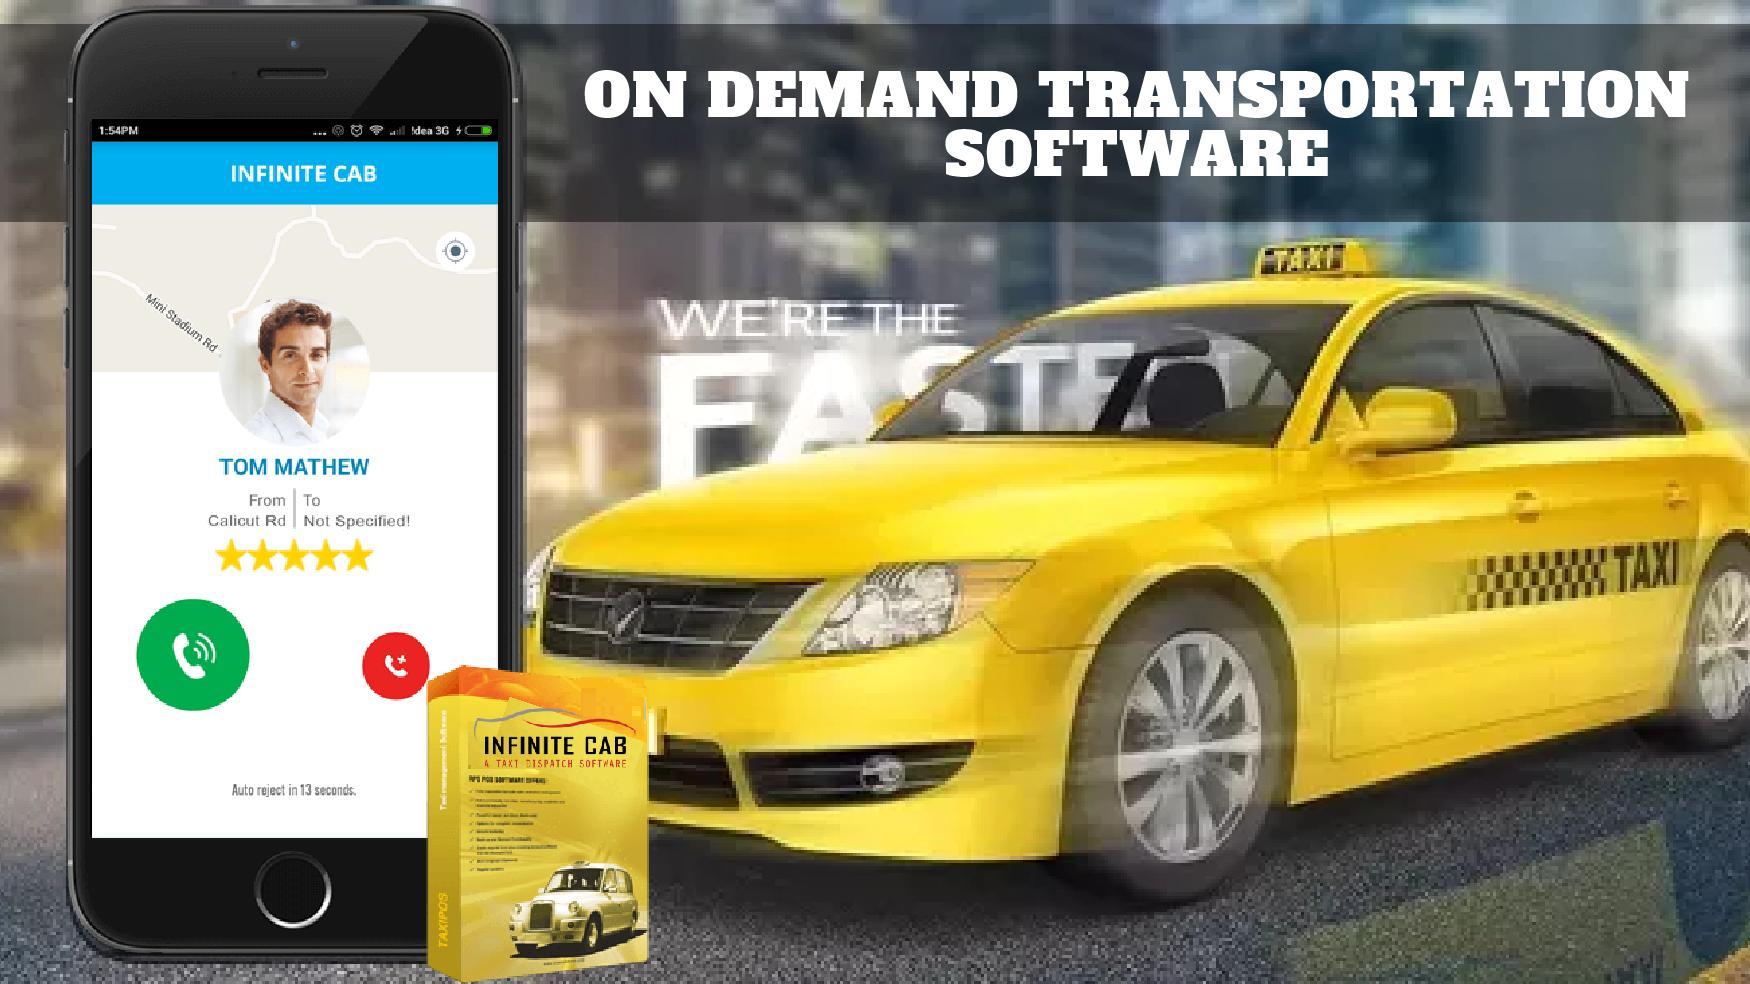 on demand transportation software